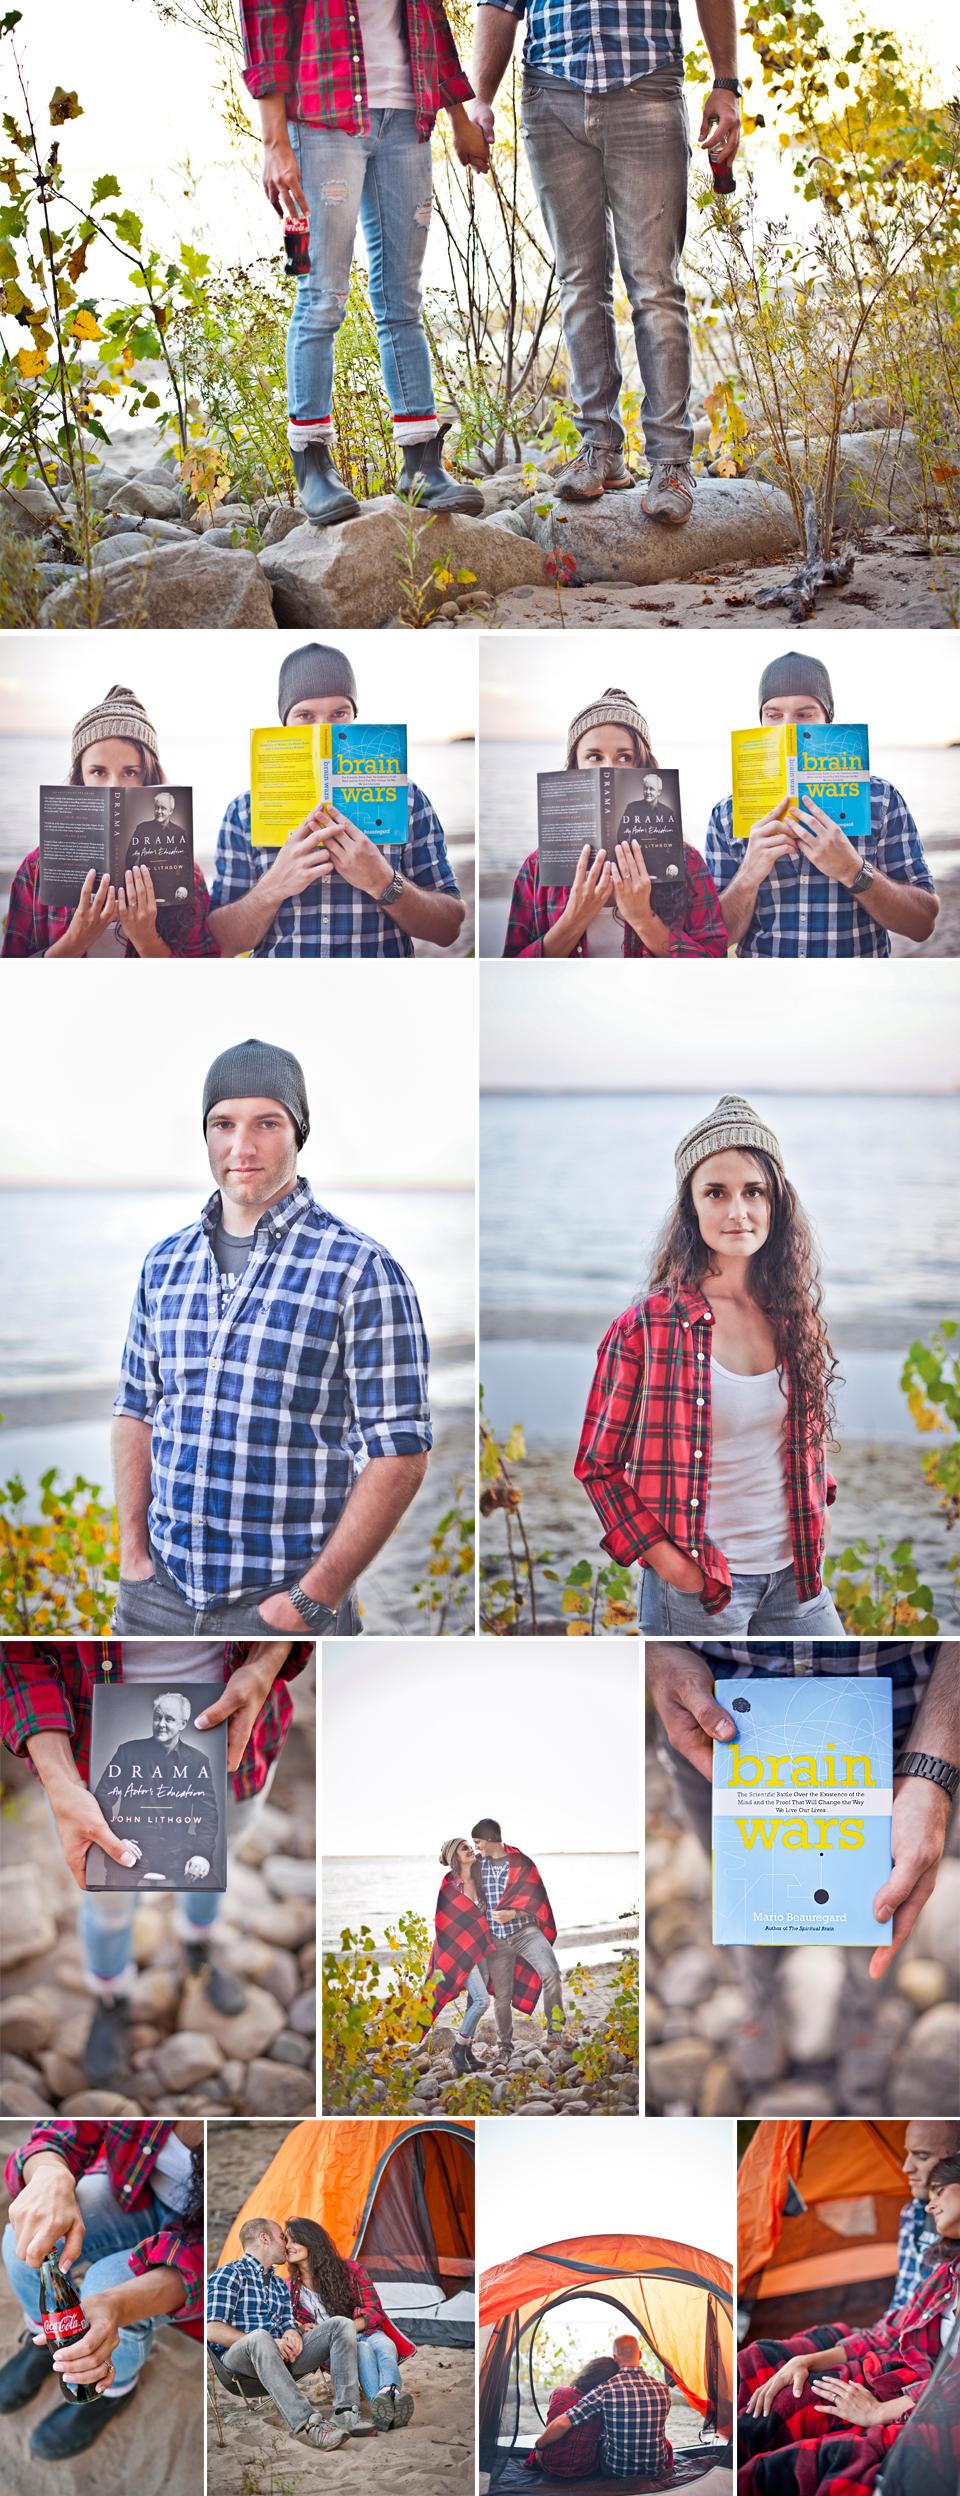 Wedding Photographer Montreal   Oka Beach Quebec   Camping   LMP Wedding Photography and Videography   Camping